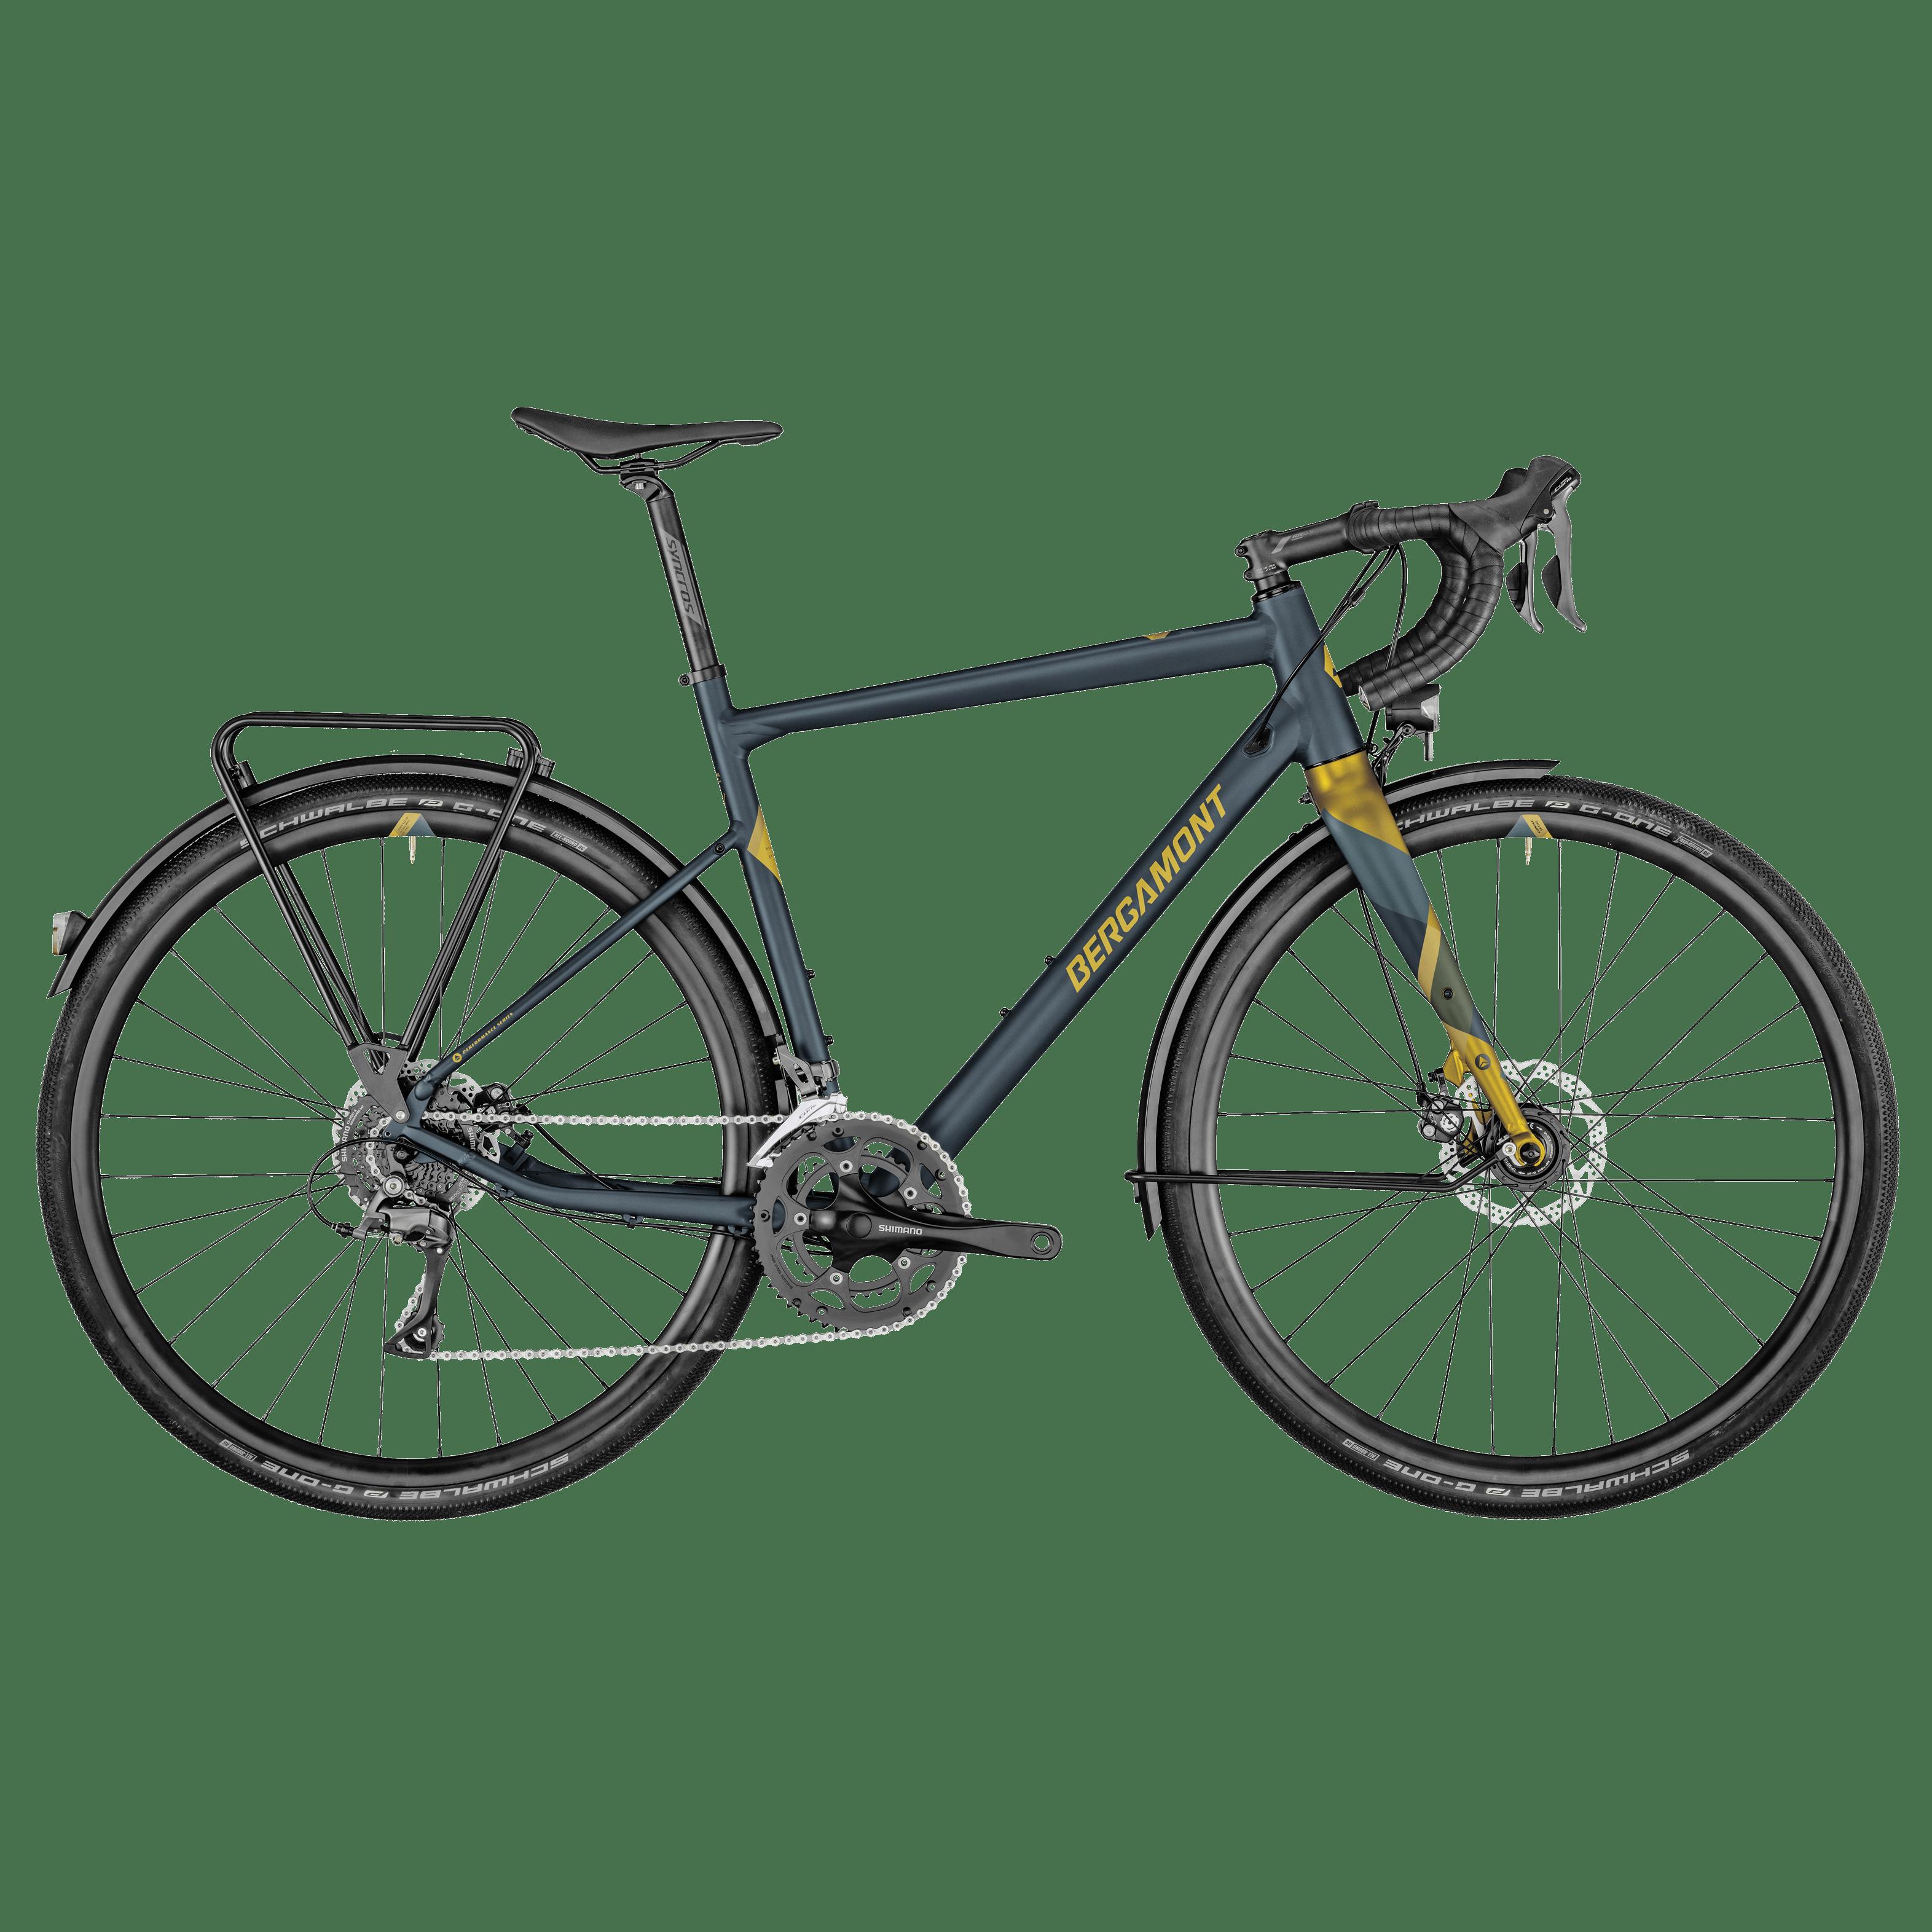 Esprit velo Bergamont Grandurance RD 3 Petrol